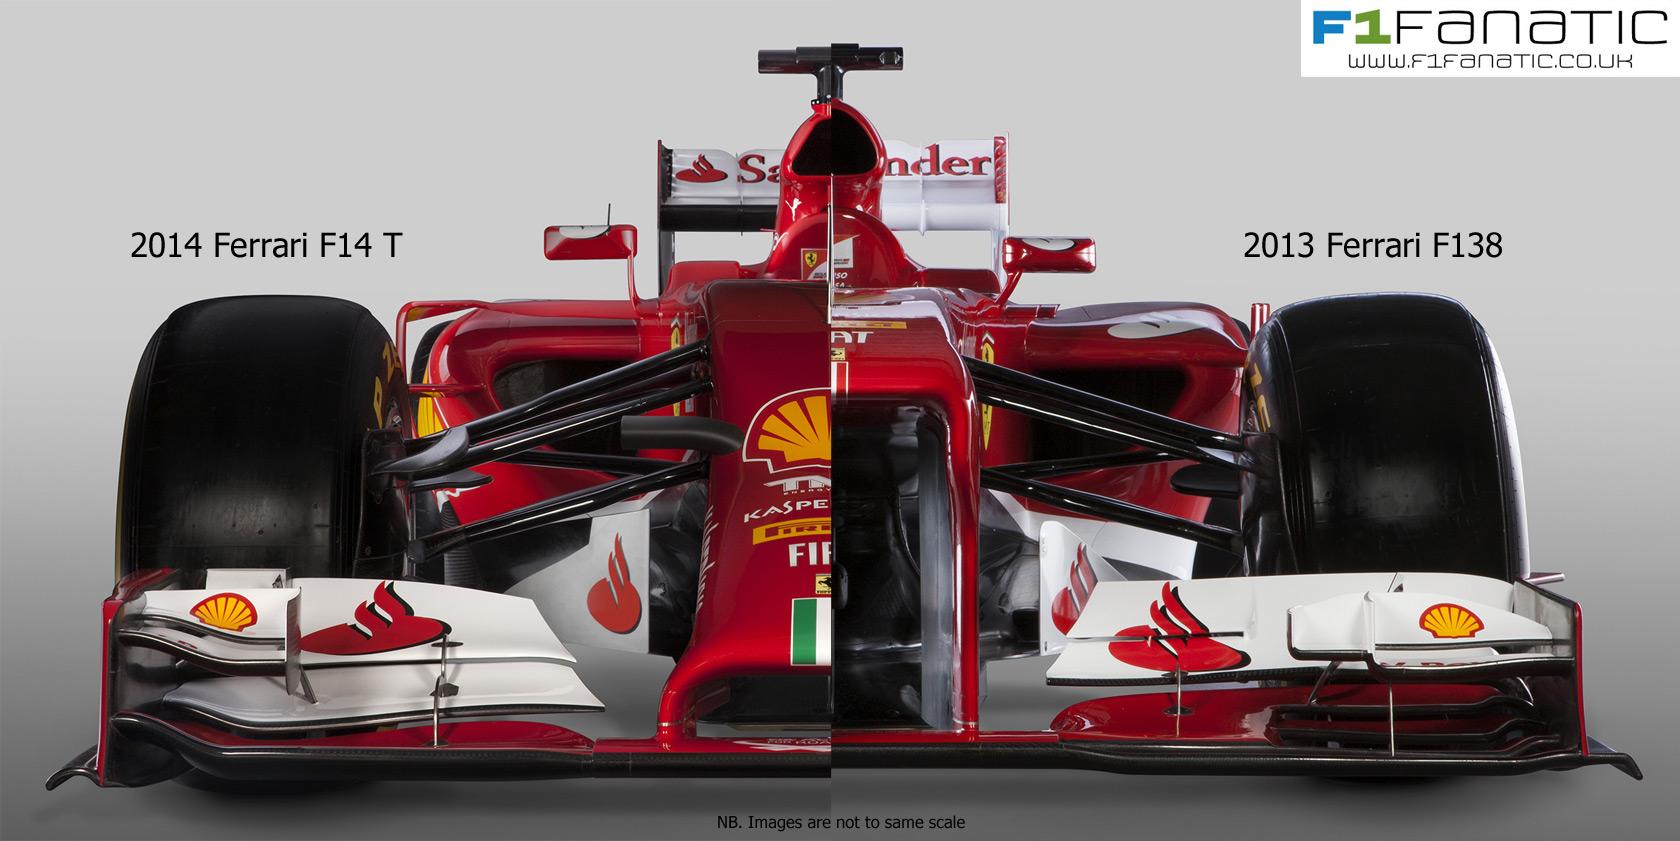 Ferrari F14 T and F138 - front